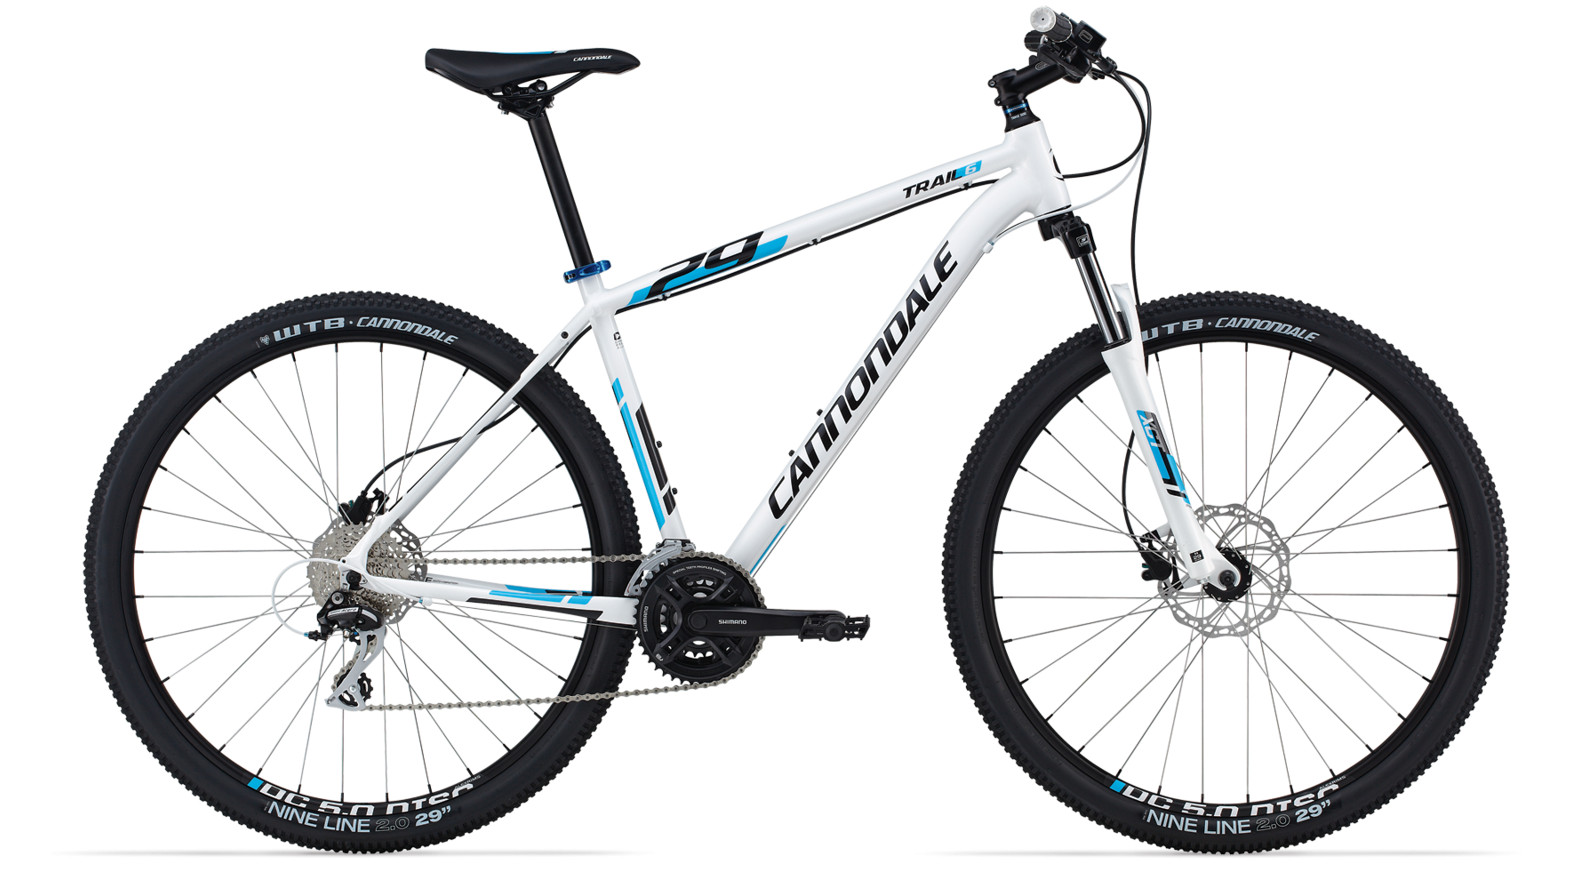 bike - 2014 Cannondale Trail 29 6 - white